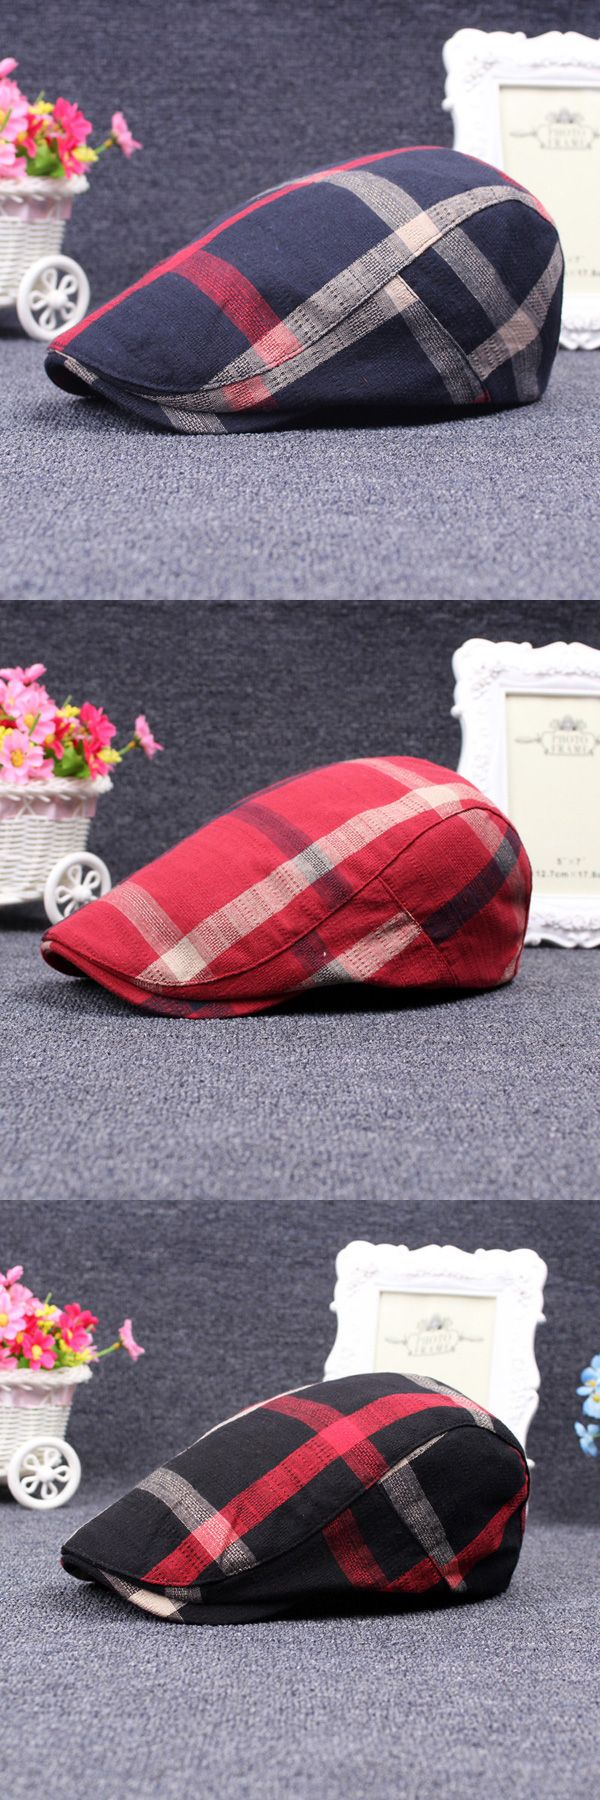 Men Women Plaid Grid Berets Caps / Casual Cotton Flat Hats